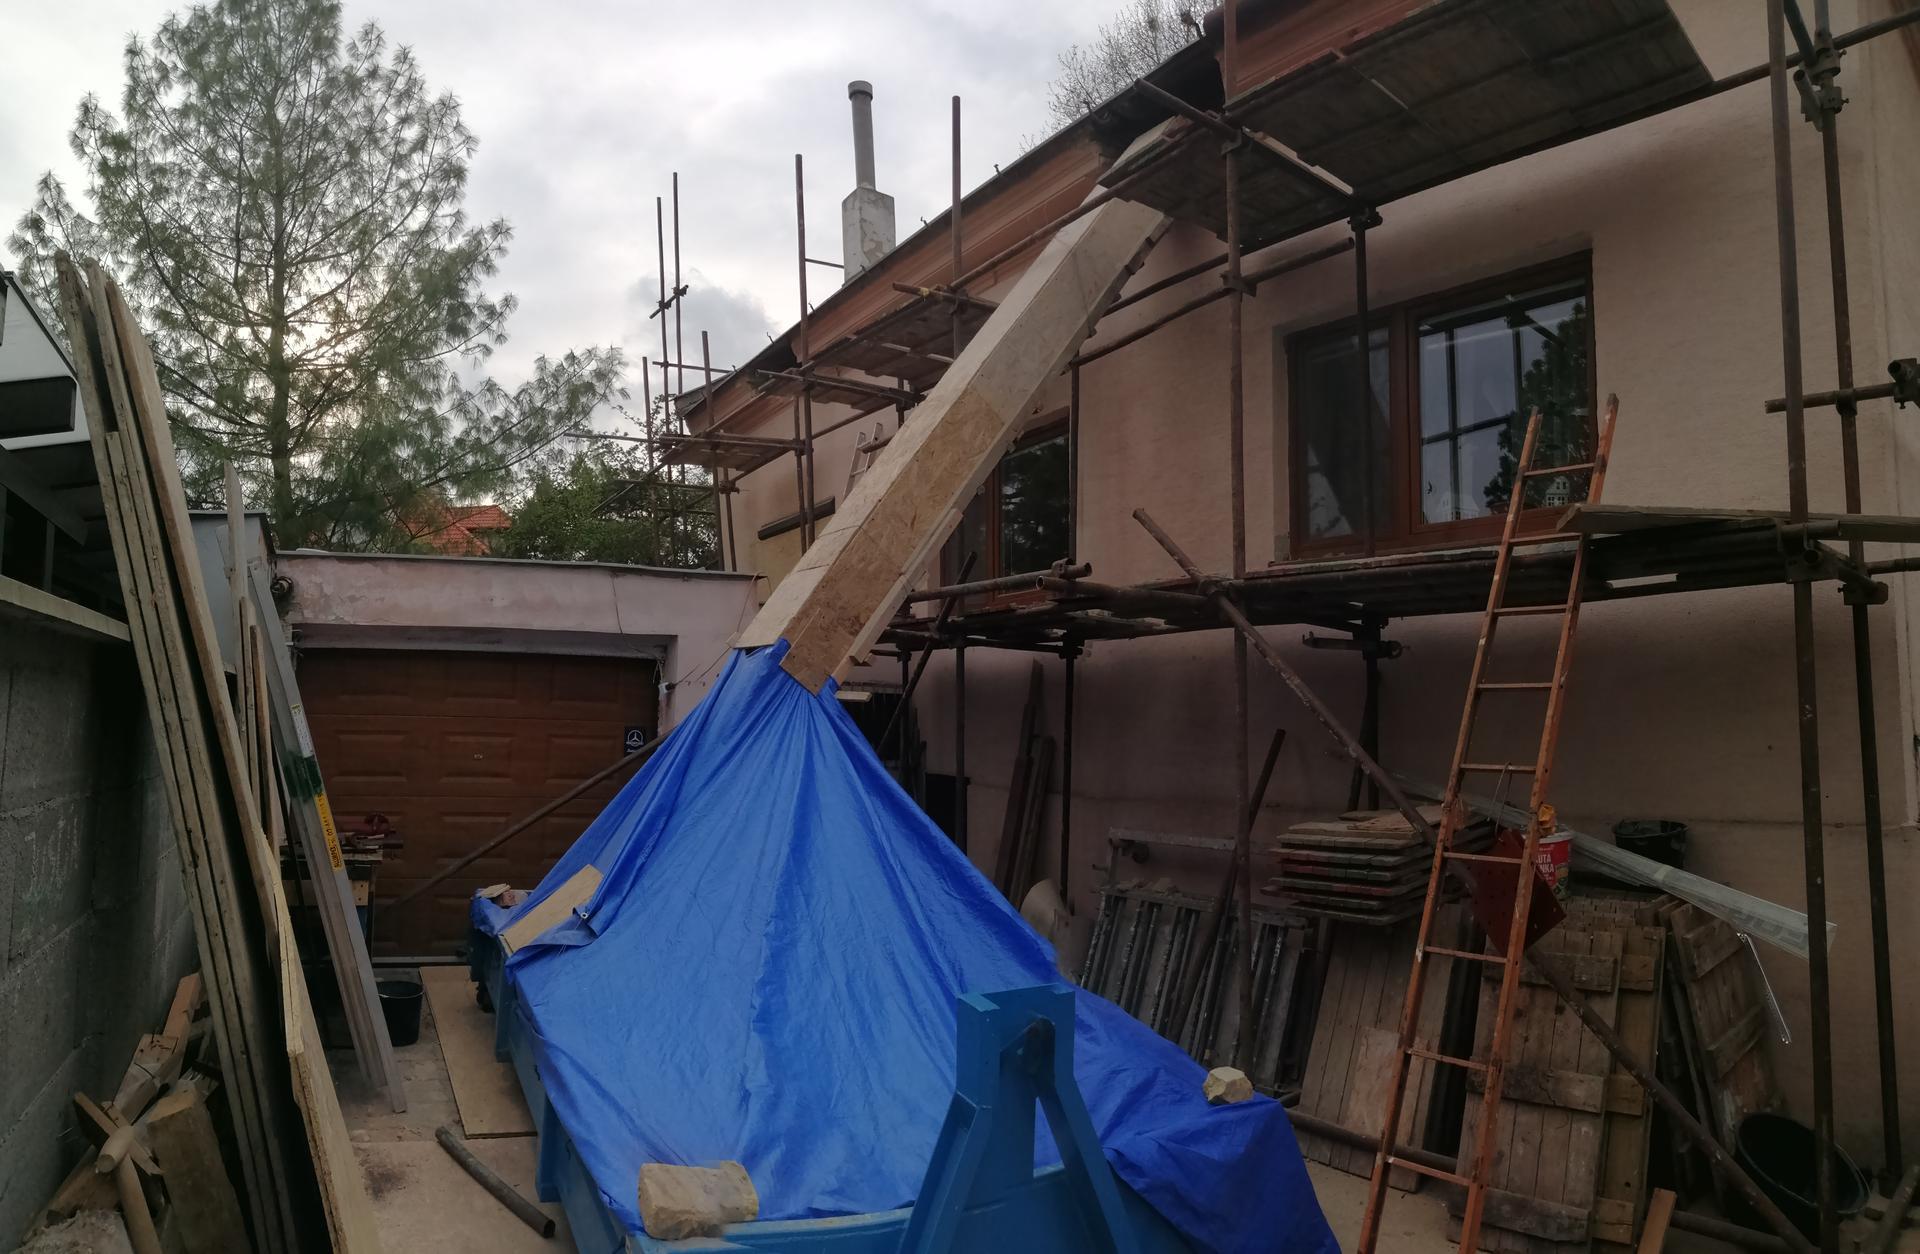 Prestavba podkrovia zo sedlovo valbovej na sedlovú strechu. - Obrázok č. 39